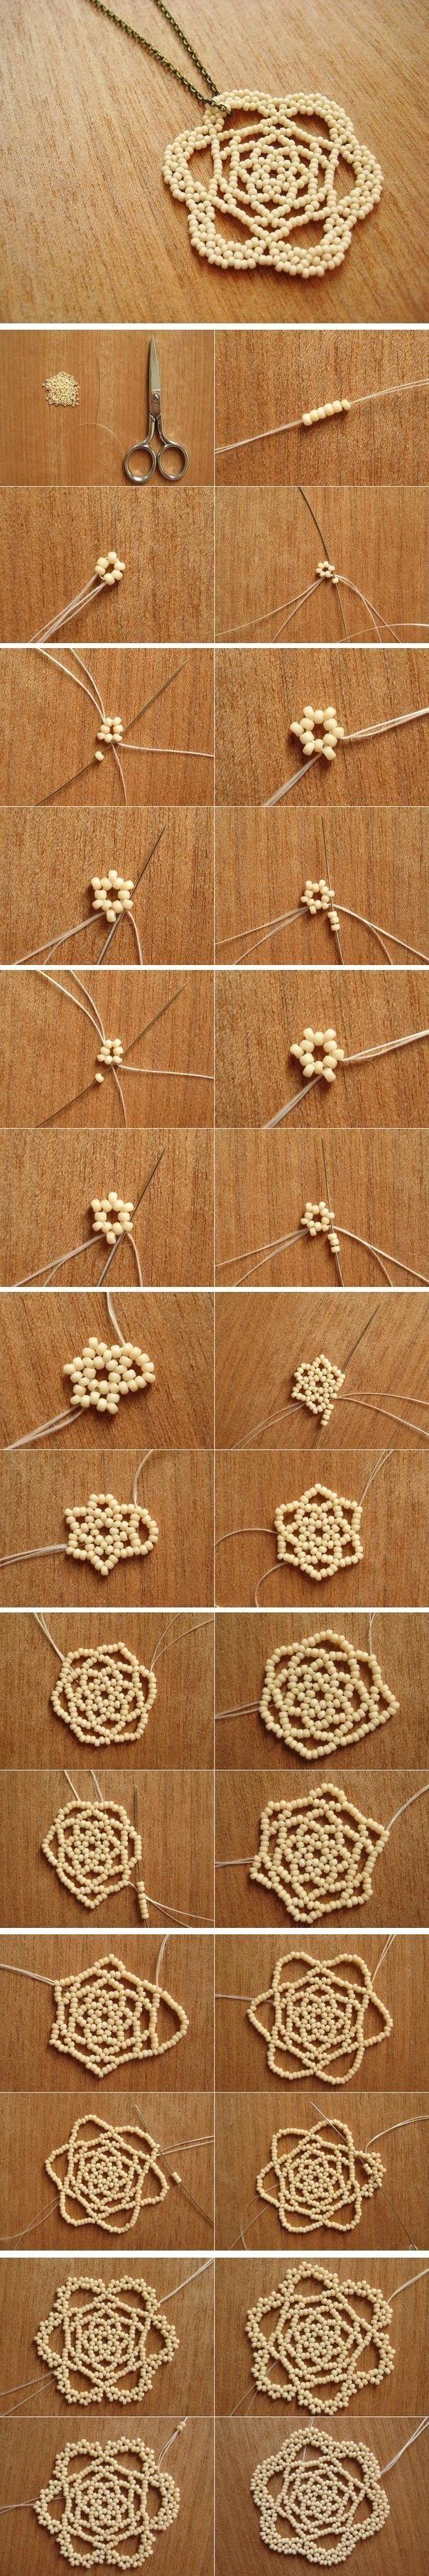 Craft ideas 6189 - Pandahall.com